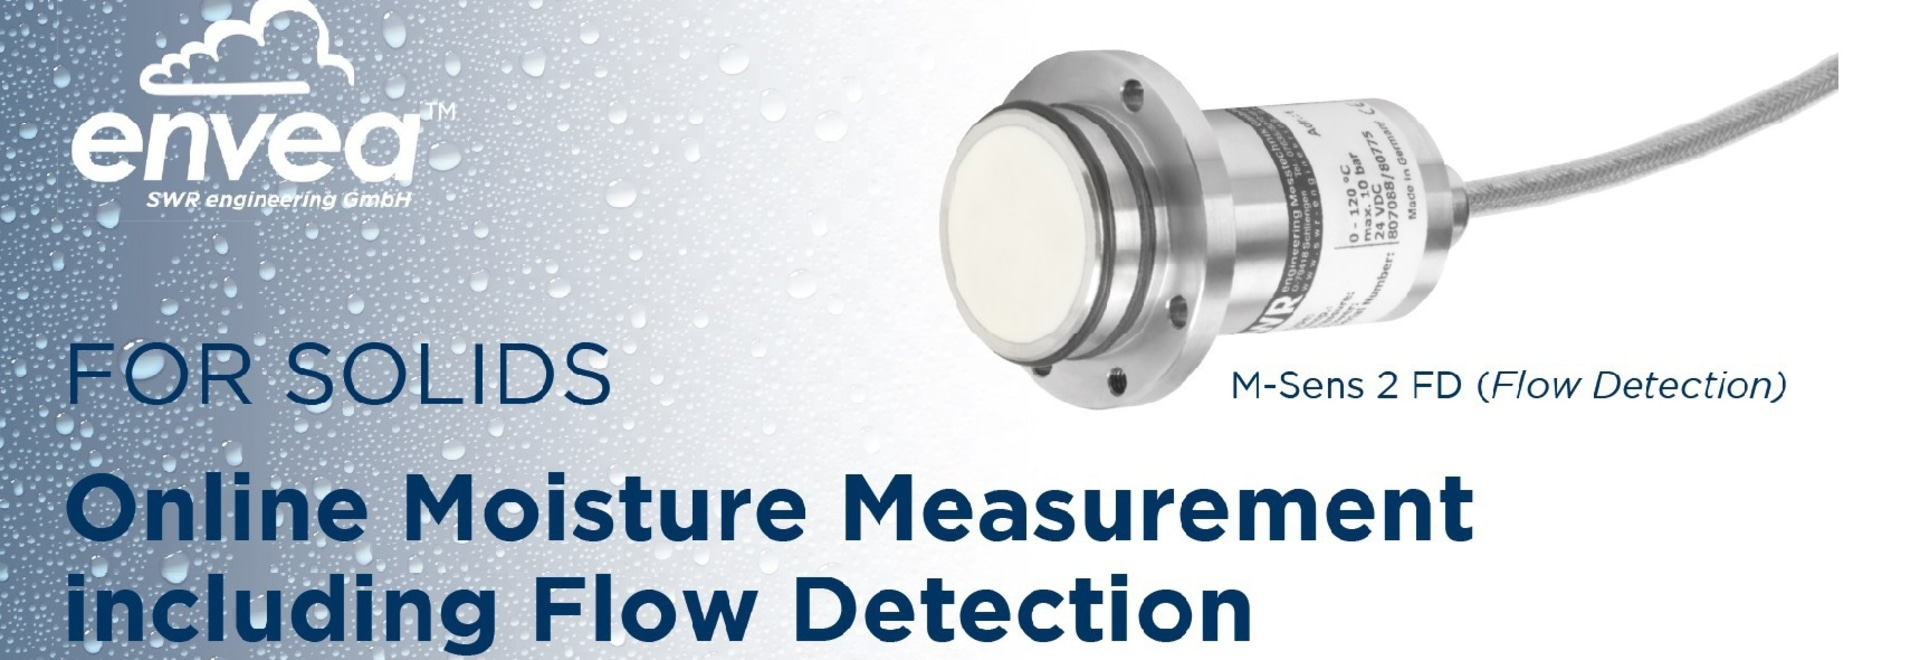 New product: Online Moisture Measurement including Flow Detection